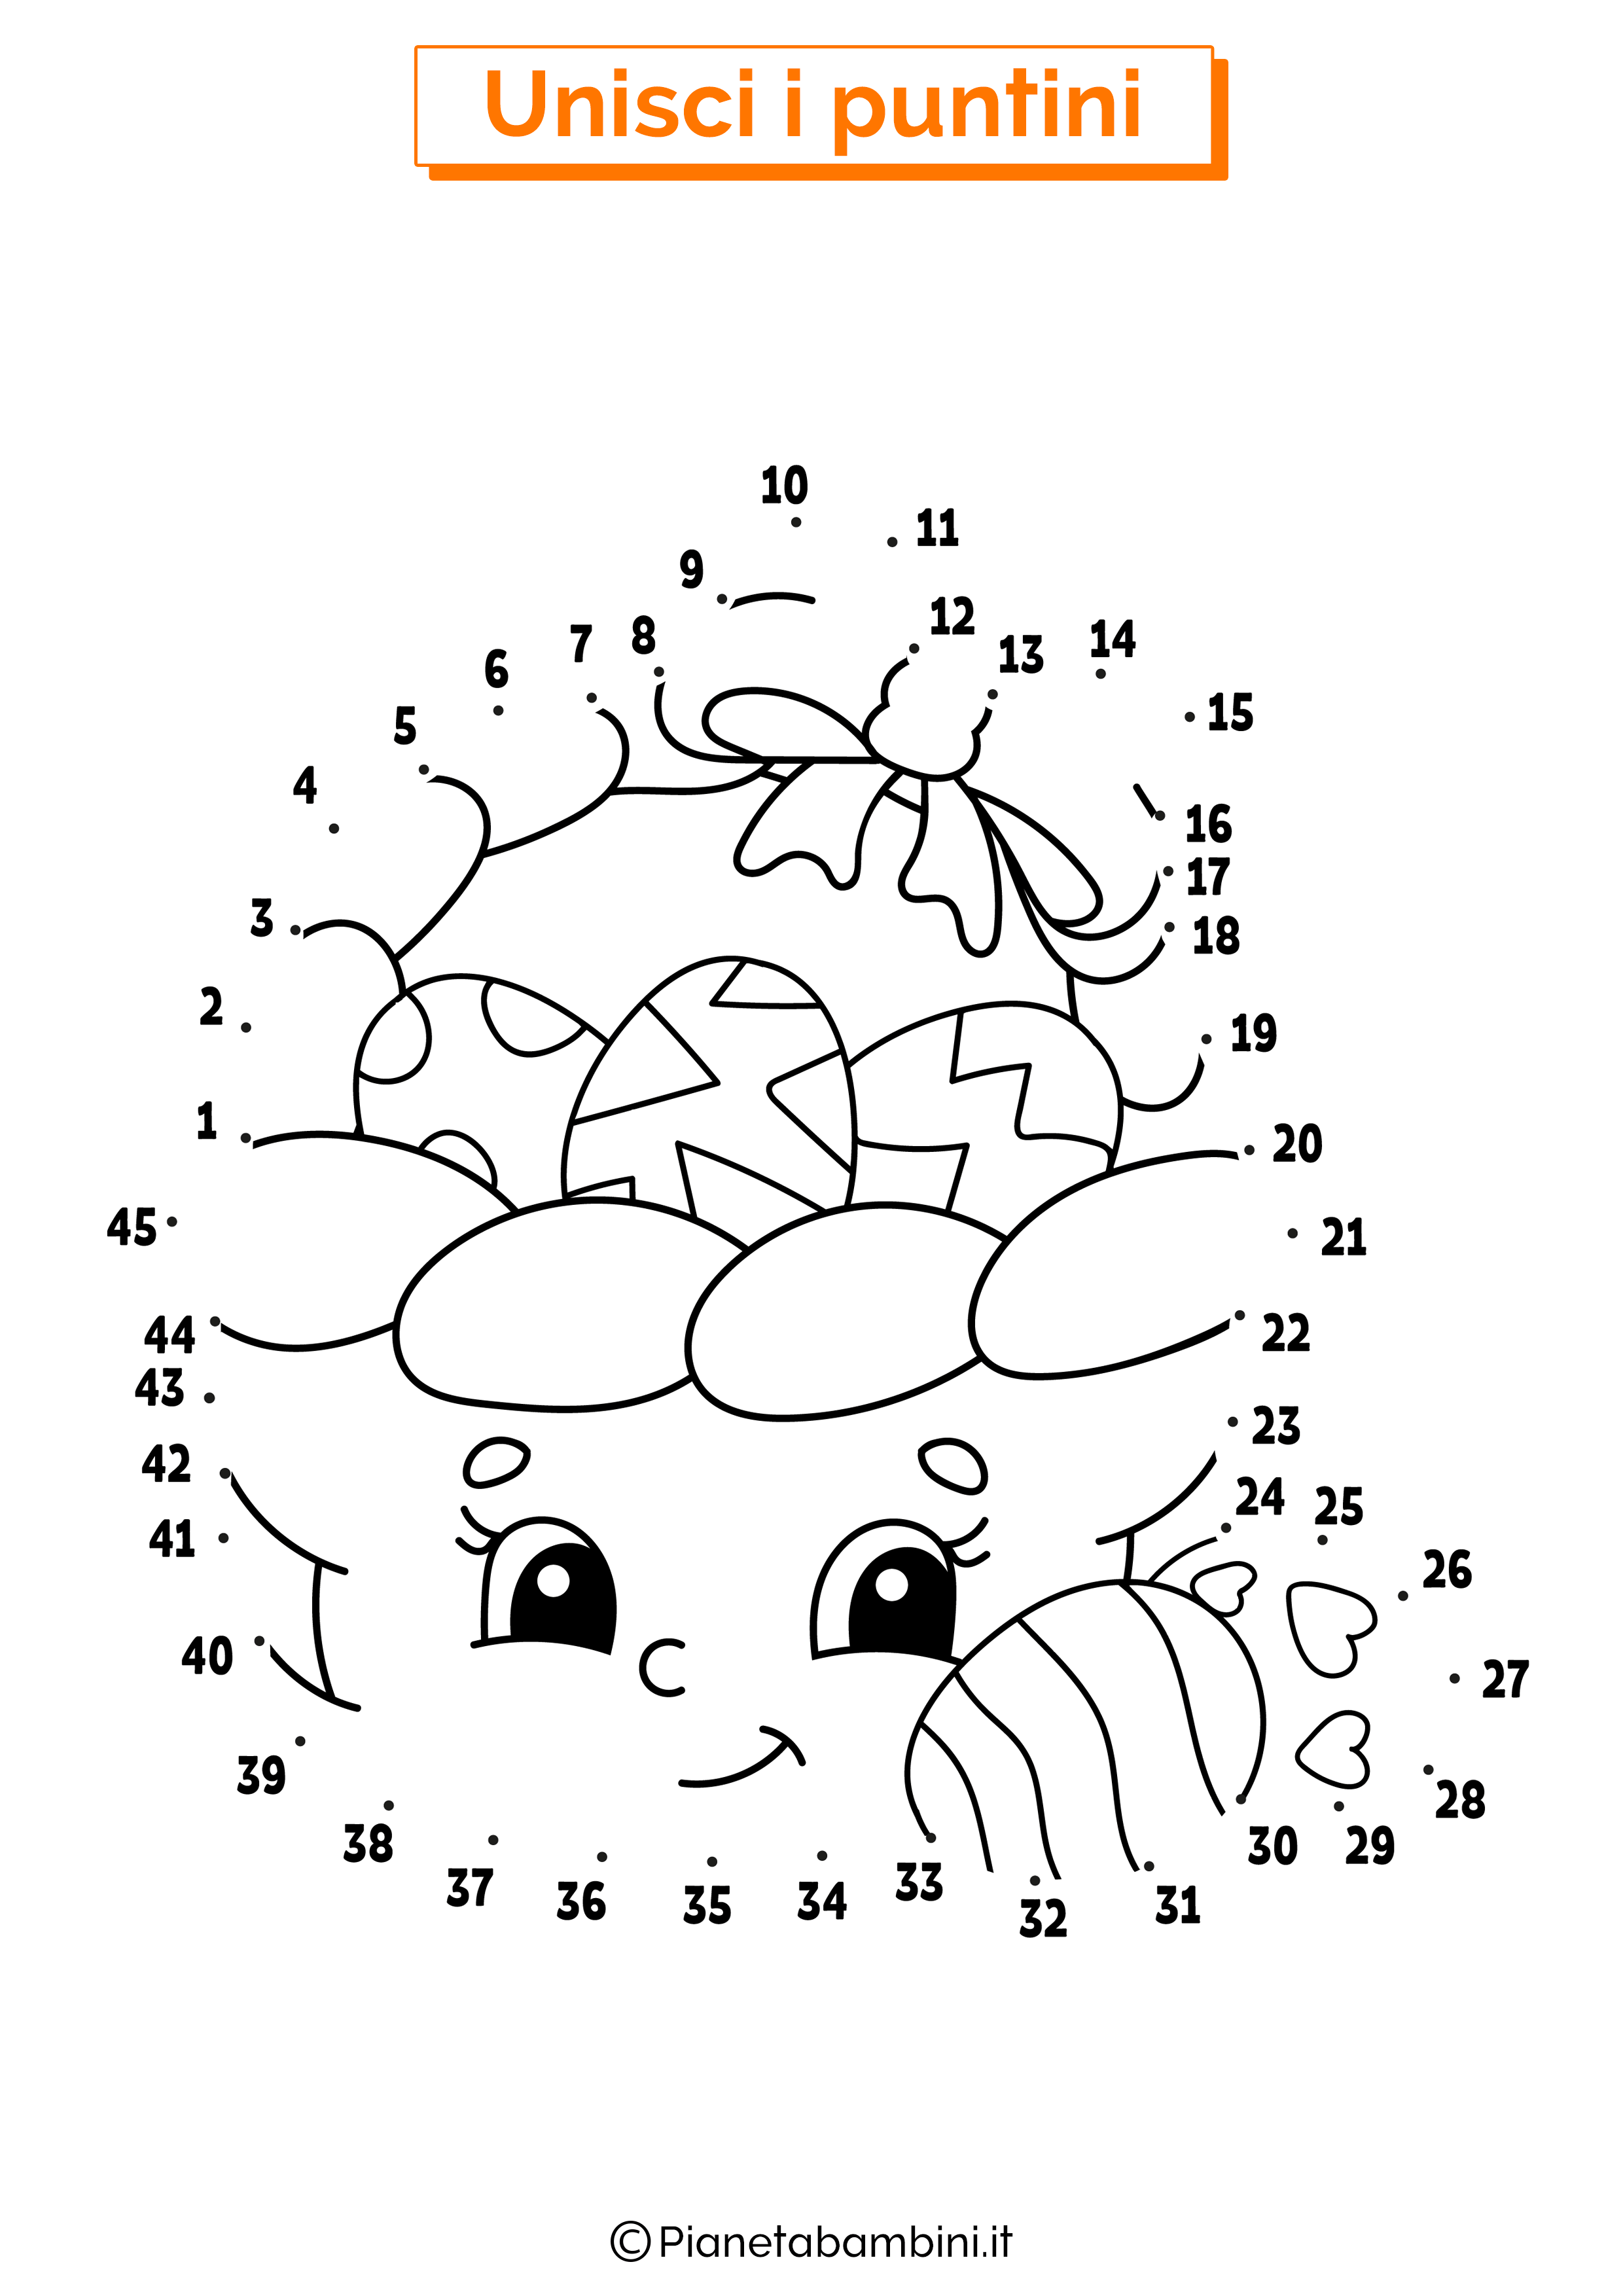 Disegno unisci i puntini 1-40 cesto uova pasquali